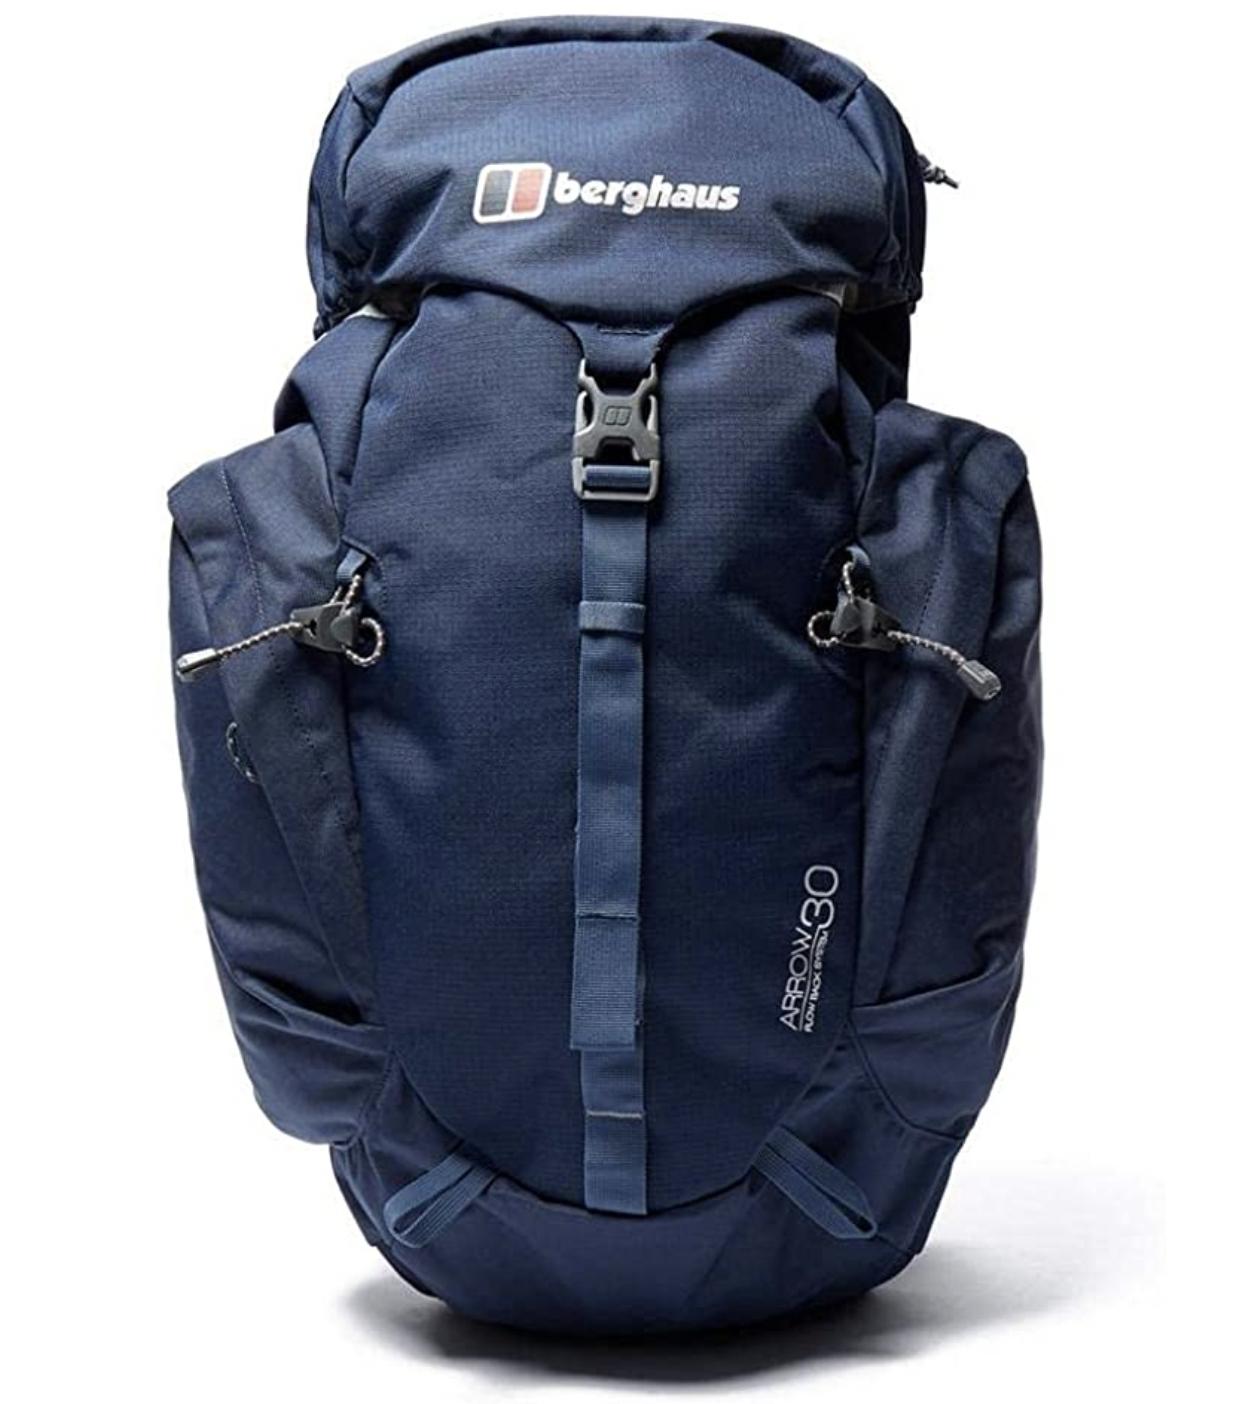 Berghaus Unisex Arrow 30 Rucksack, dark blue - £35 @ Amazon